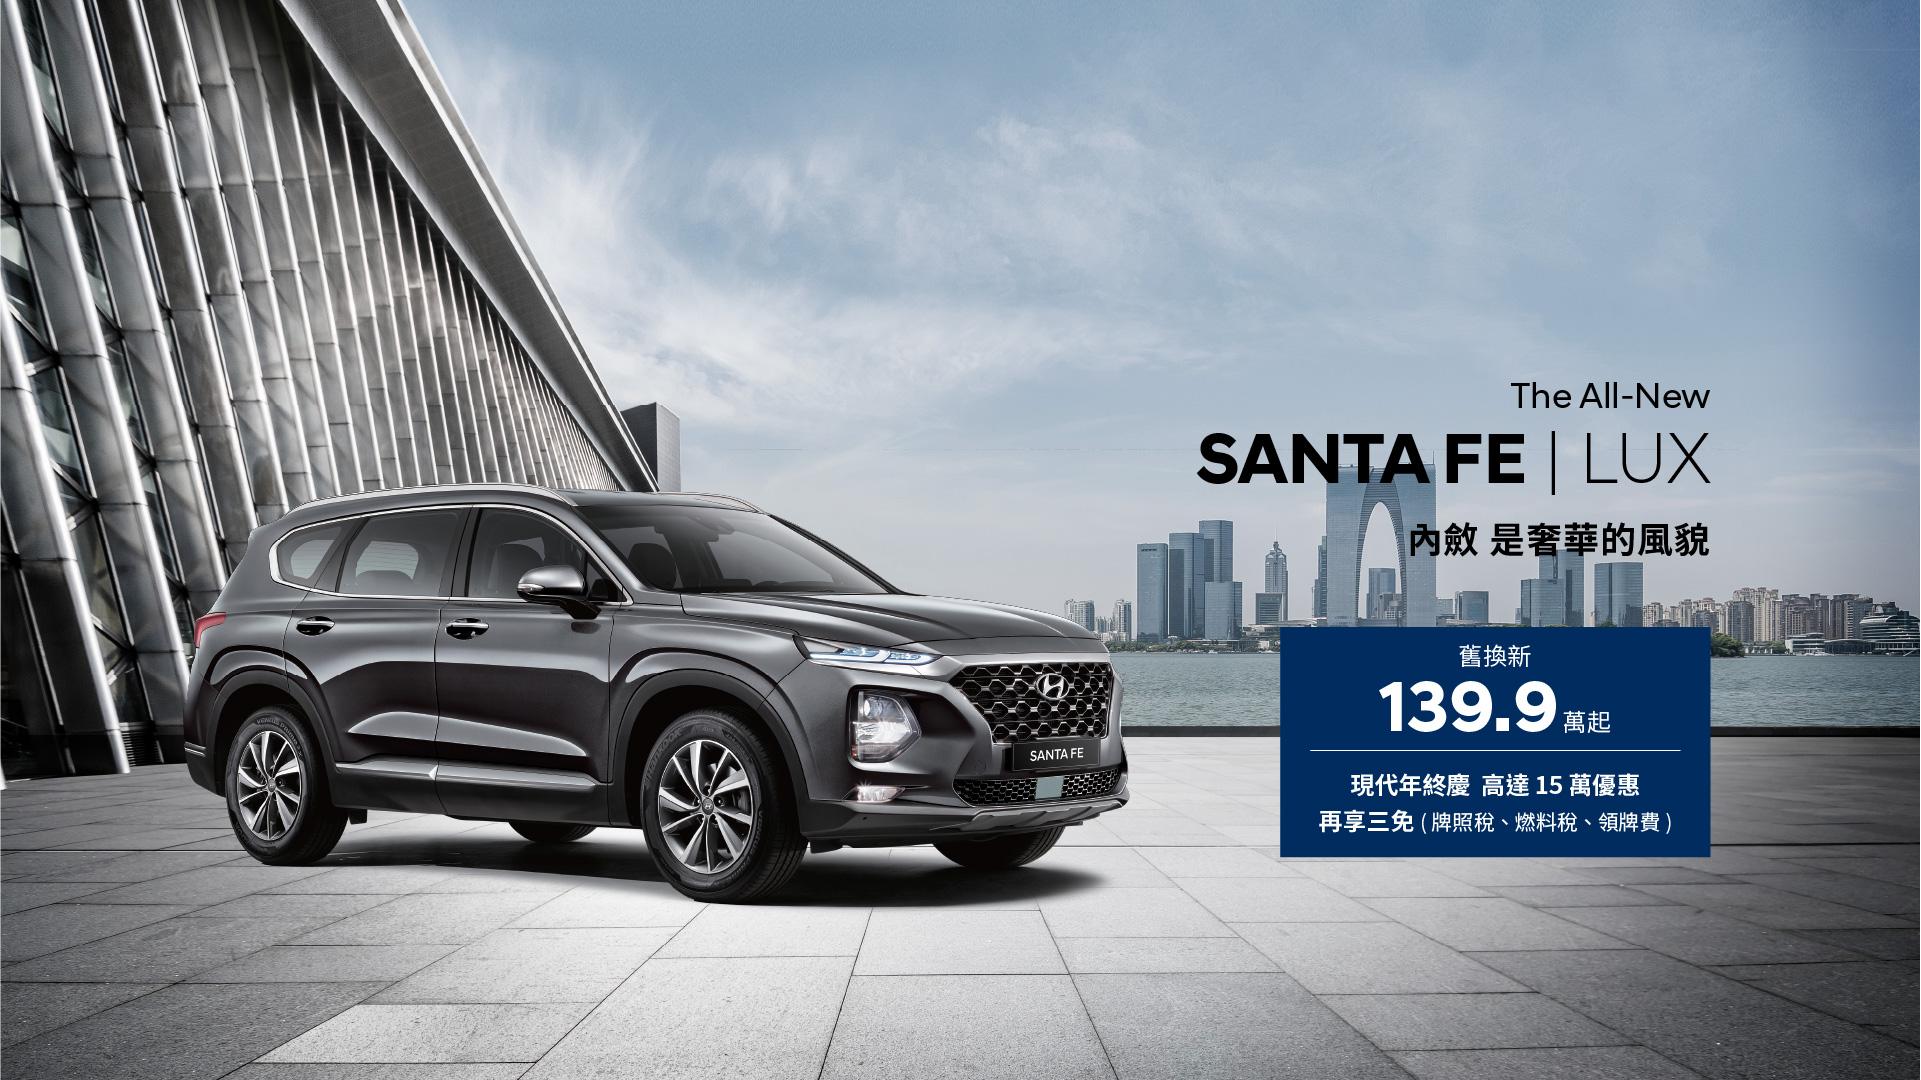 Hyundai 年終慶 Santa Fe 超高優惠 15 萬元購車金。